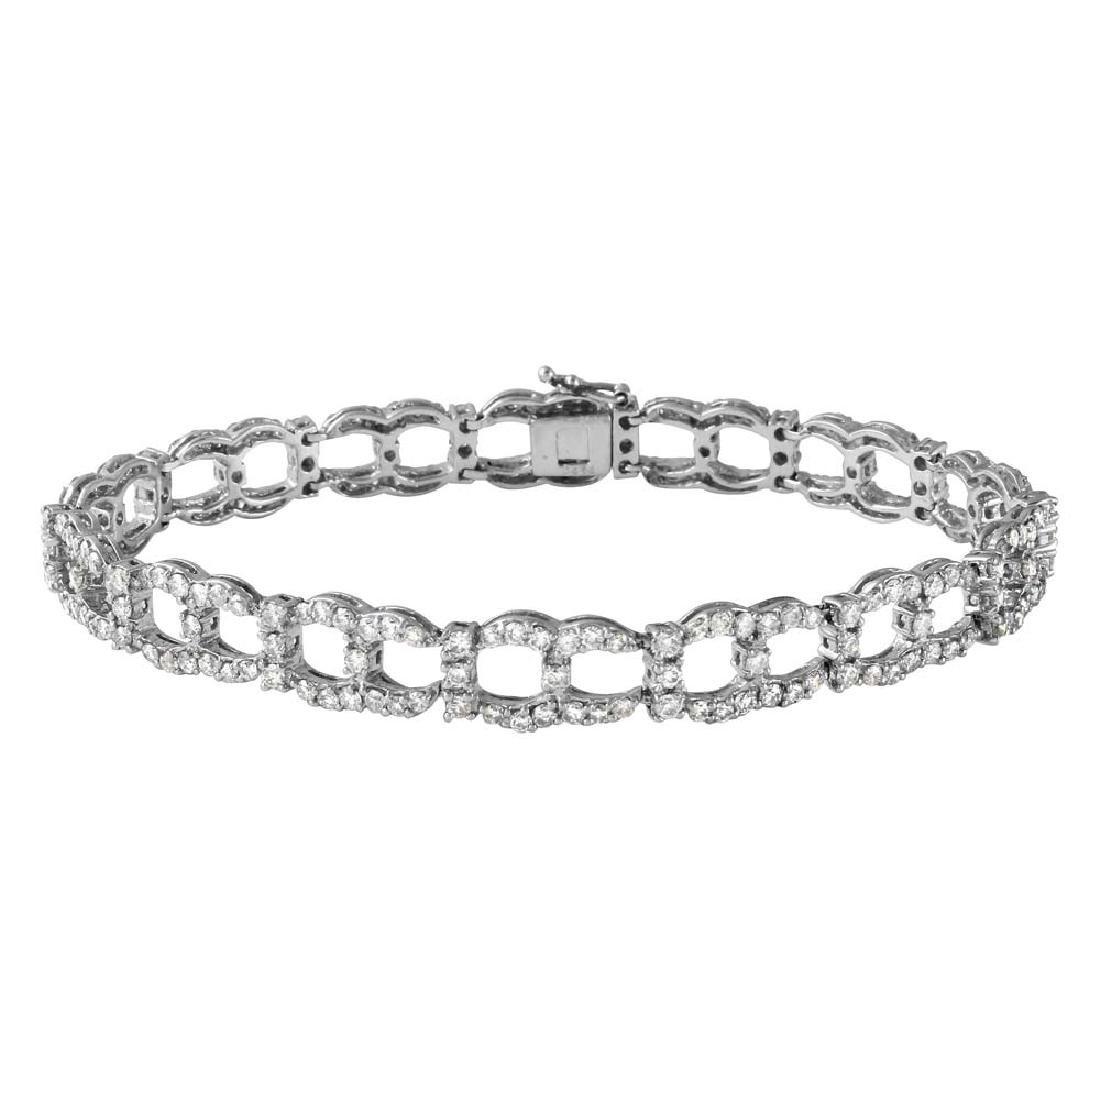 Genuine 4.54 TCW 14K White Gold Ladies Bracelet